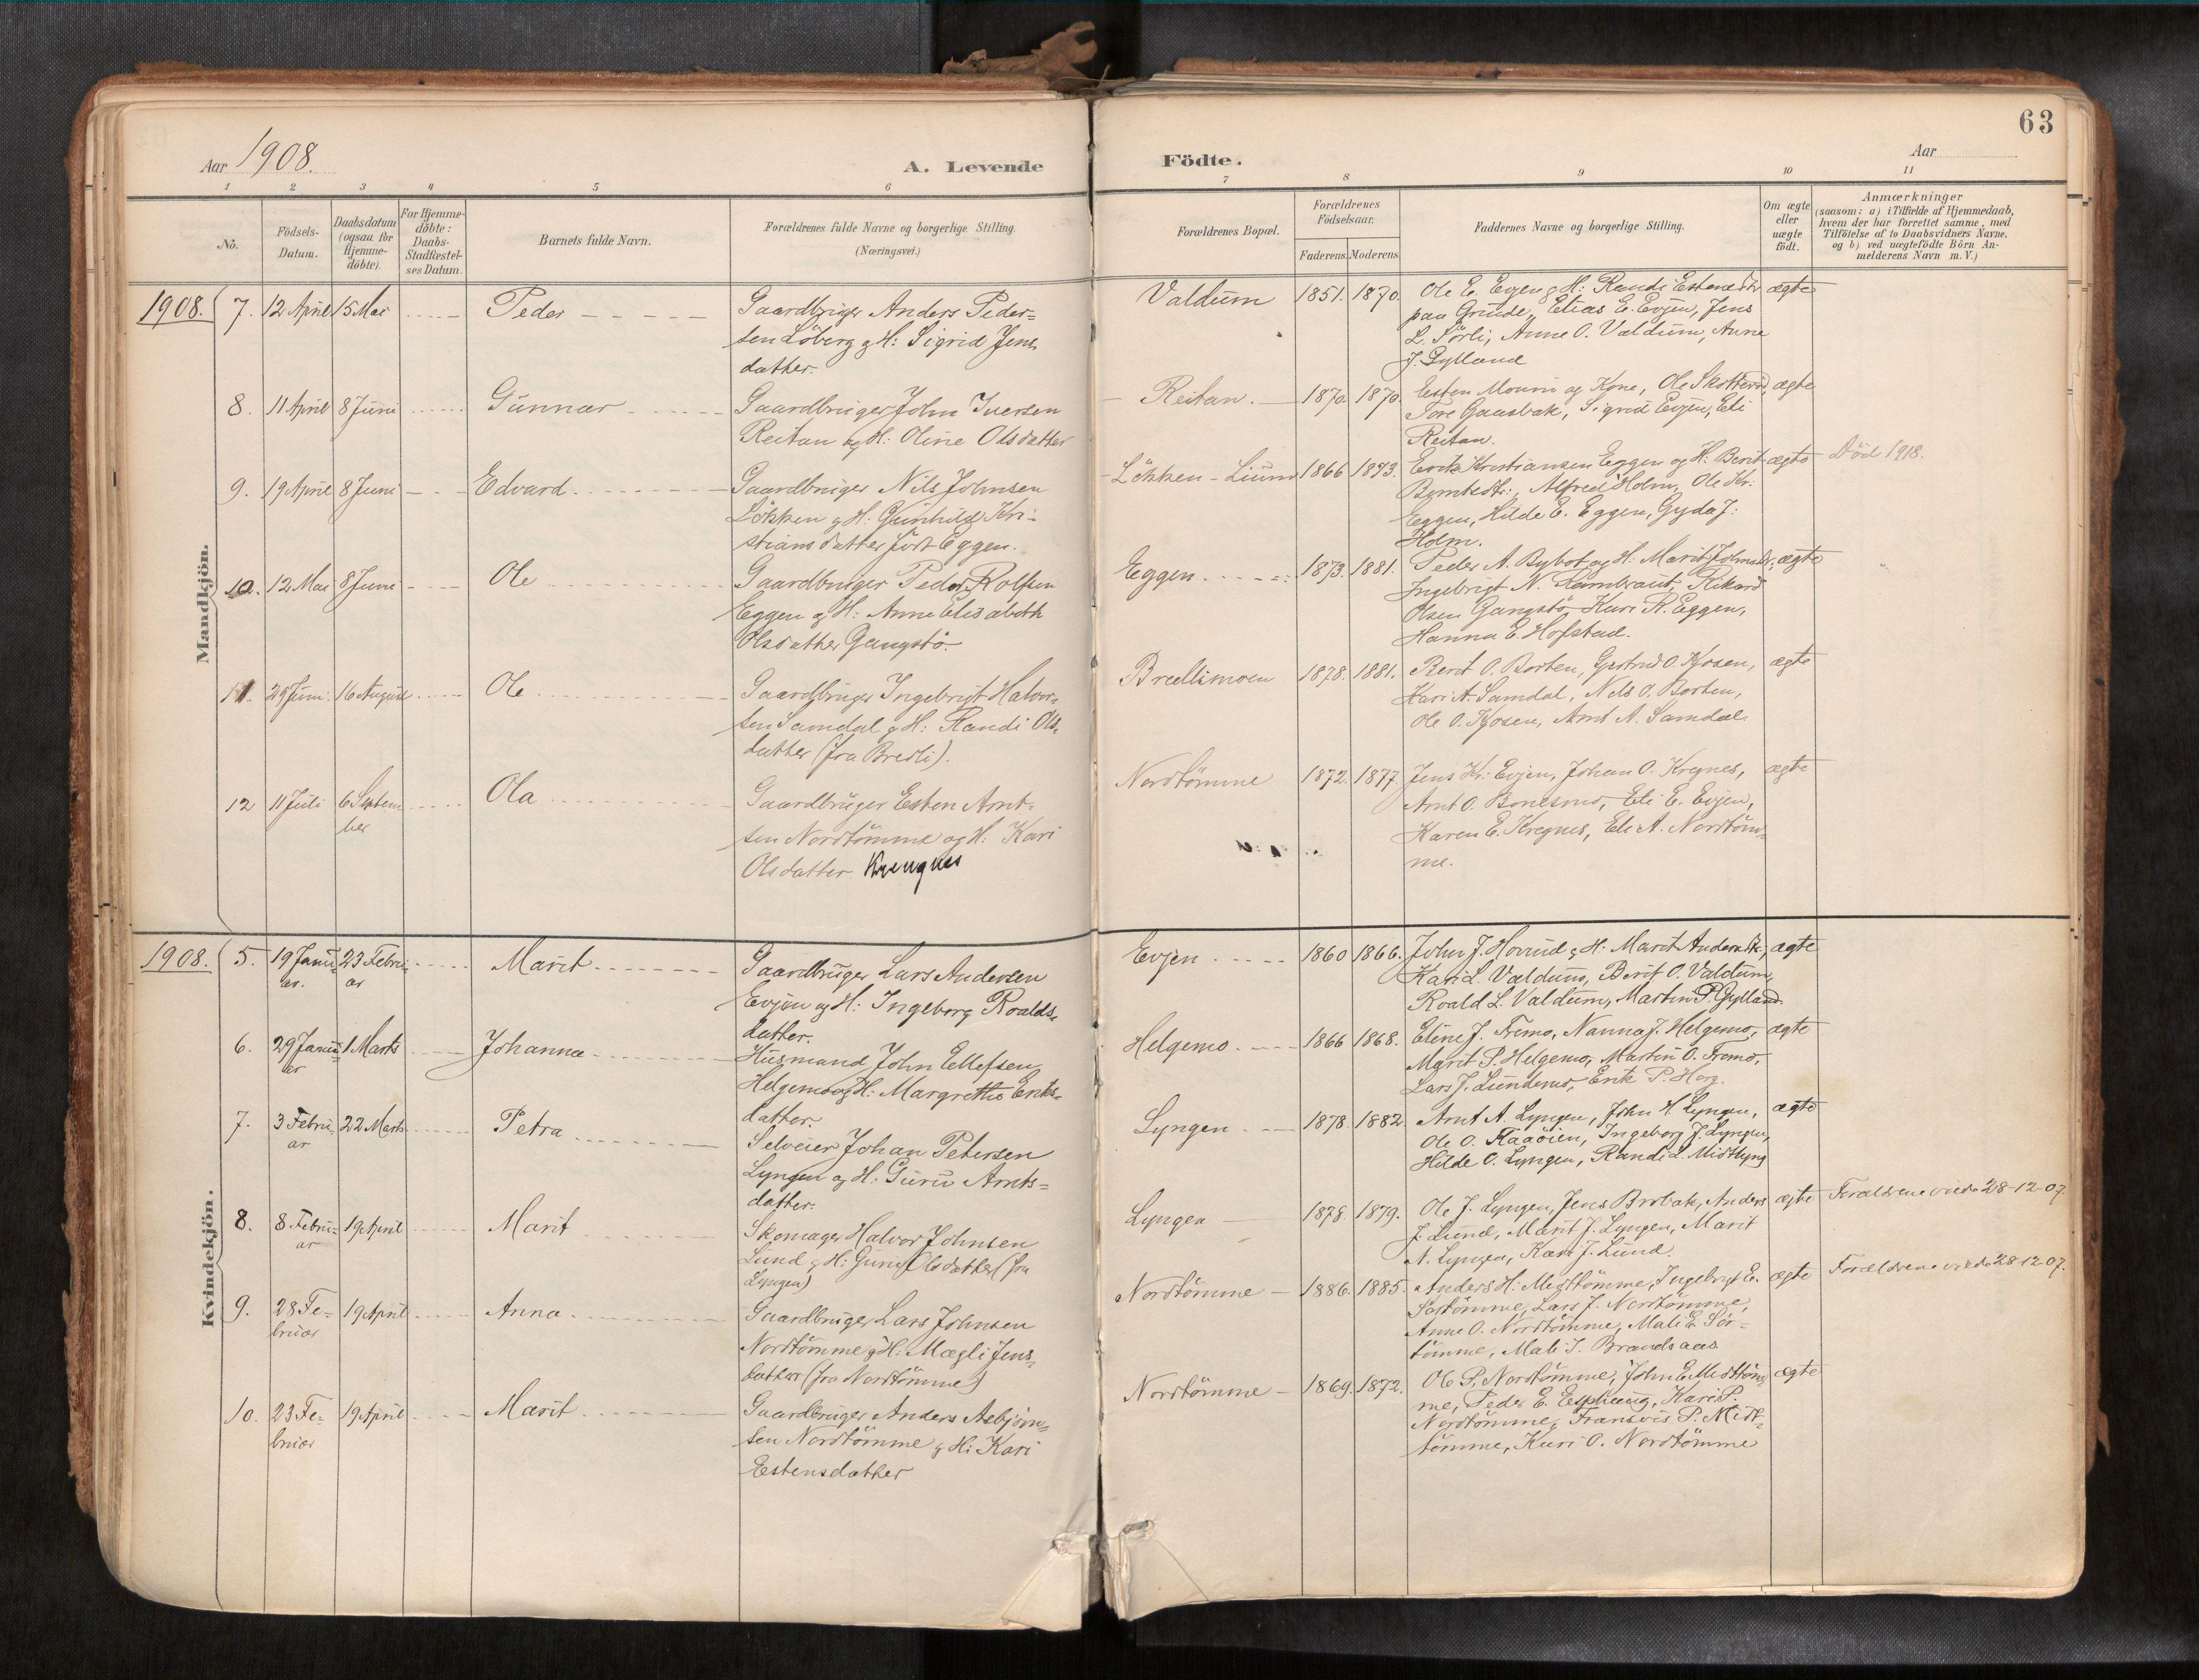 SAT, Ministerialprotokoller, klokkerbøker og fødselsregistre - Sør-Trøndelag, 692/L1105b: Parish register (official) no. 692A06, 1891-1934, p. 63